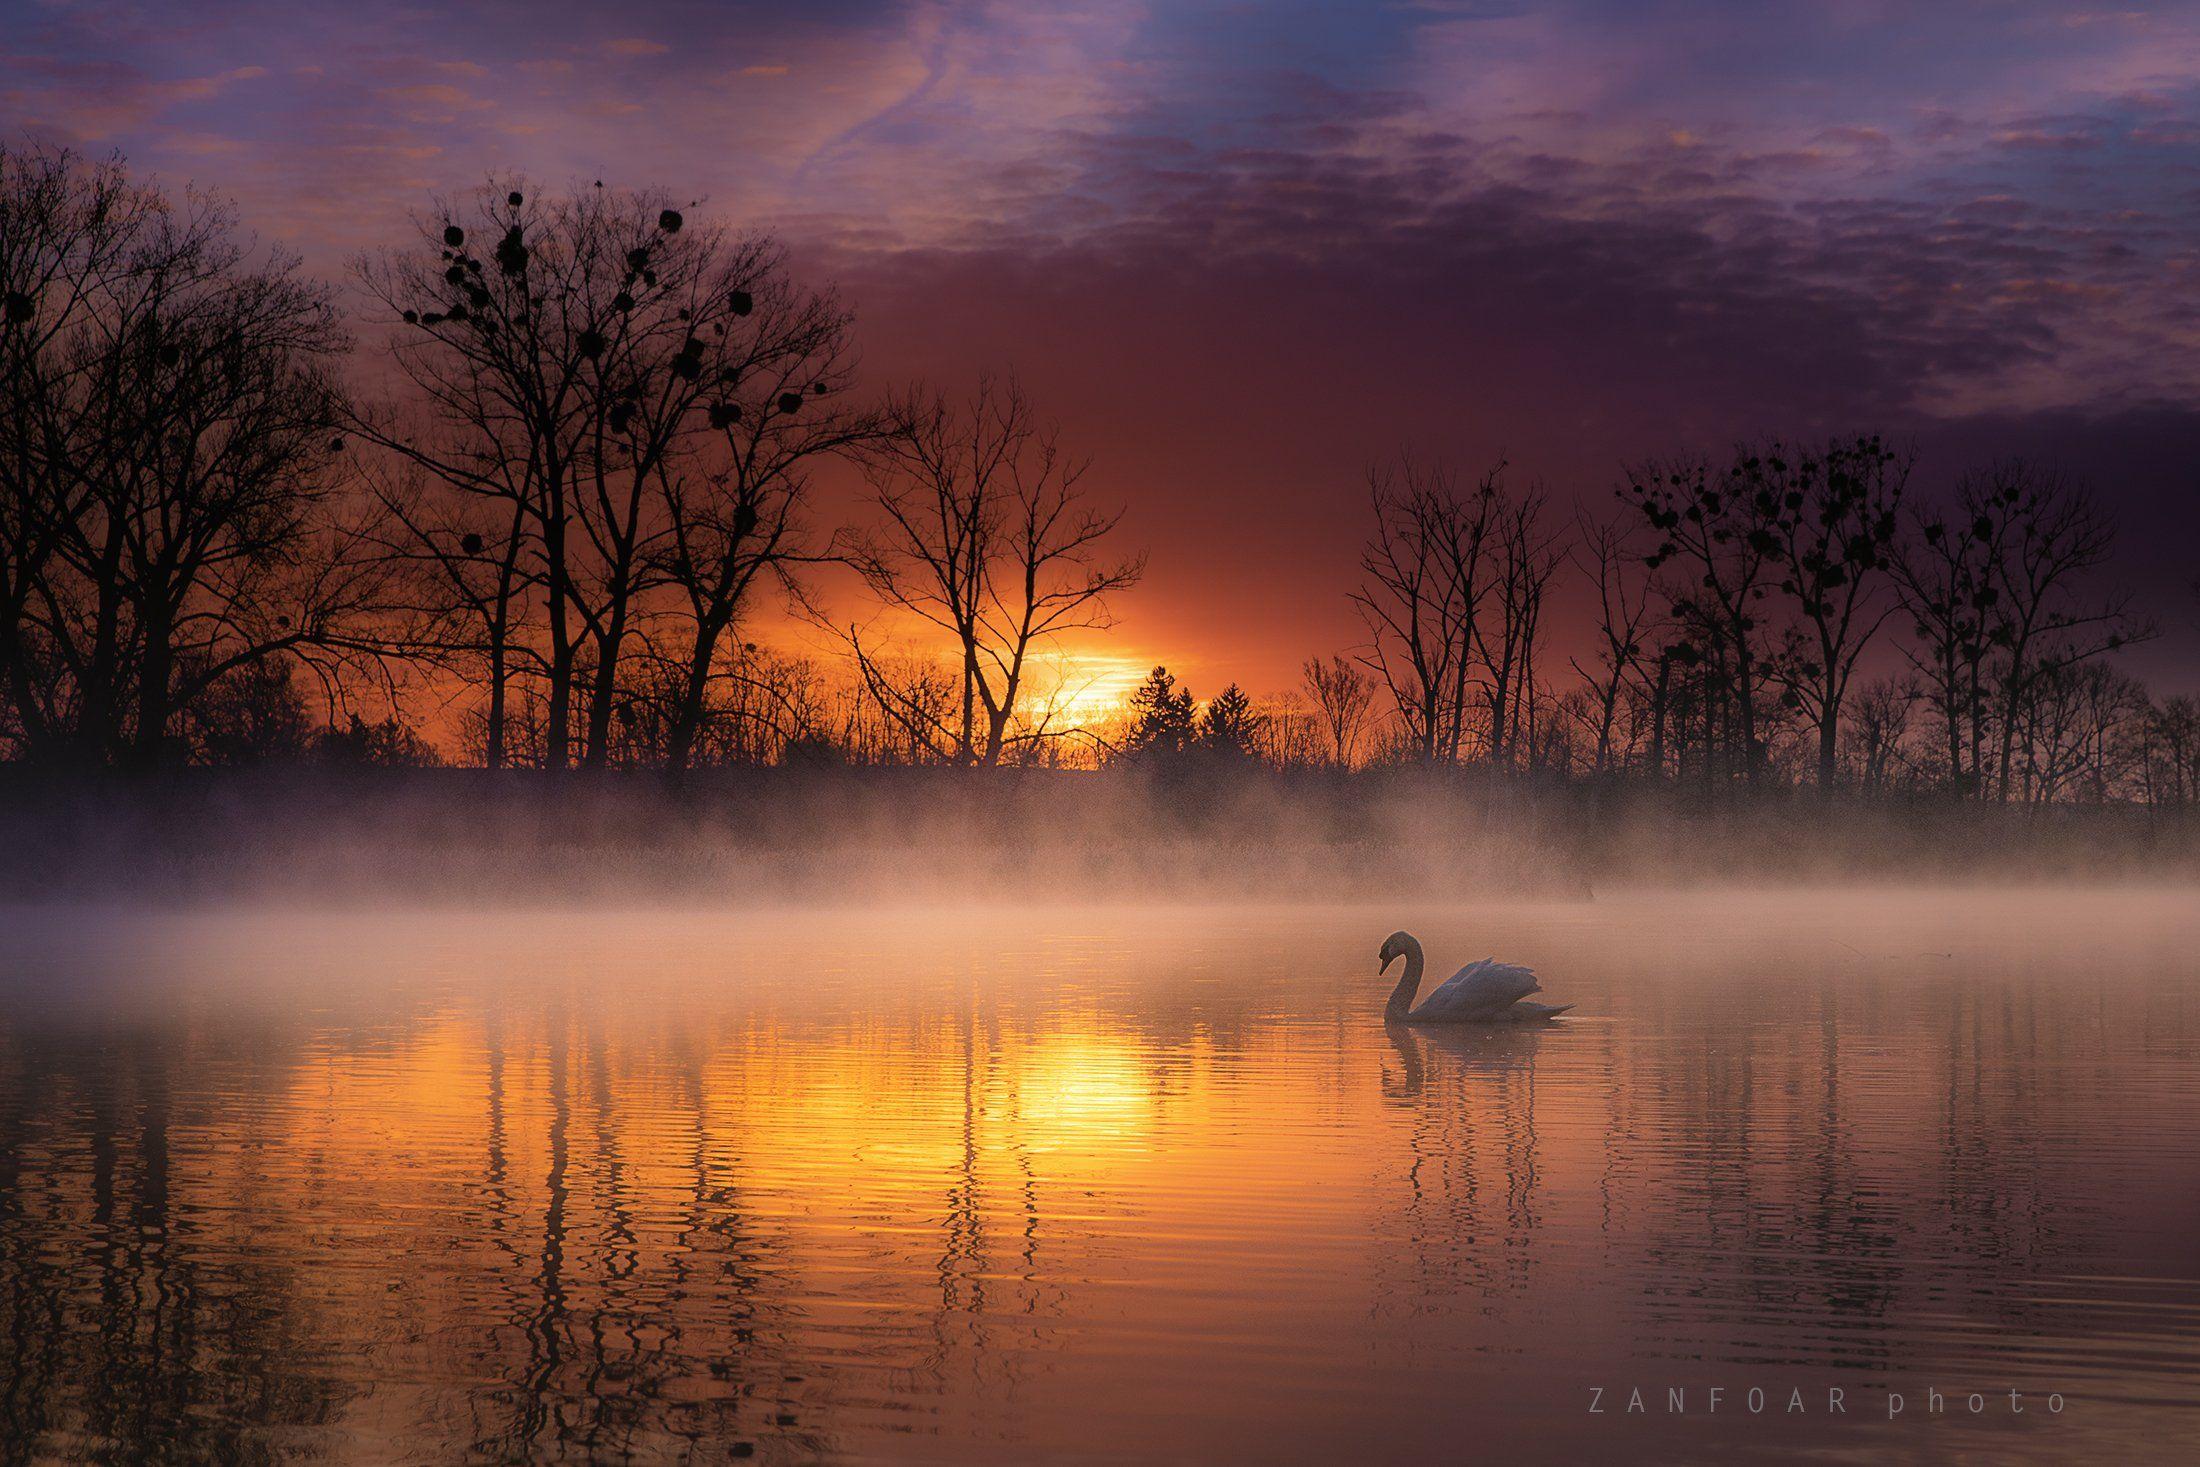 лебедь , озера,zanfoar,landsape,чехия, солнце,никон d750,czech republic, Zanfoar